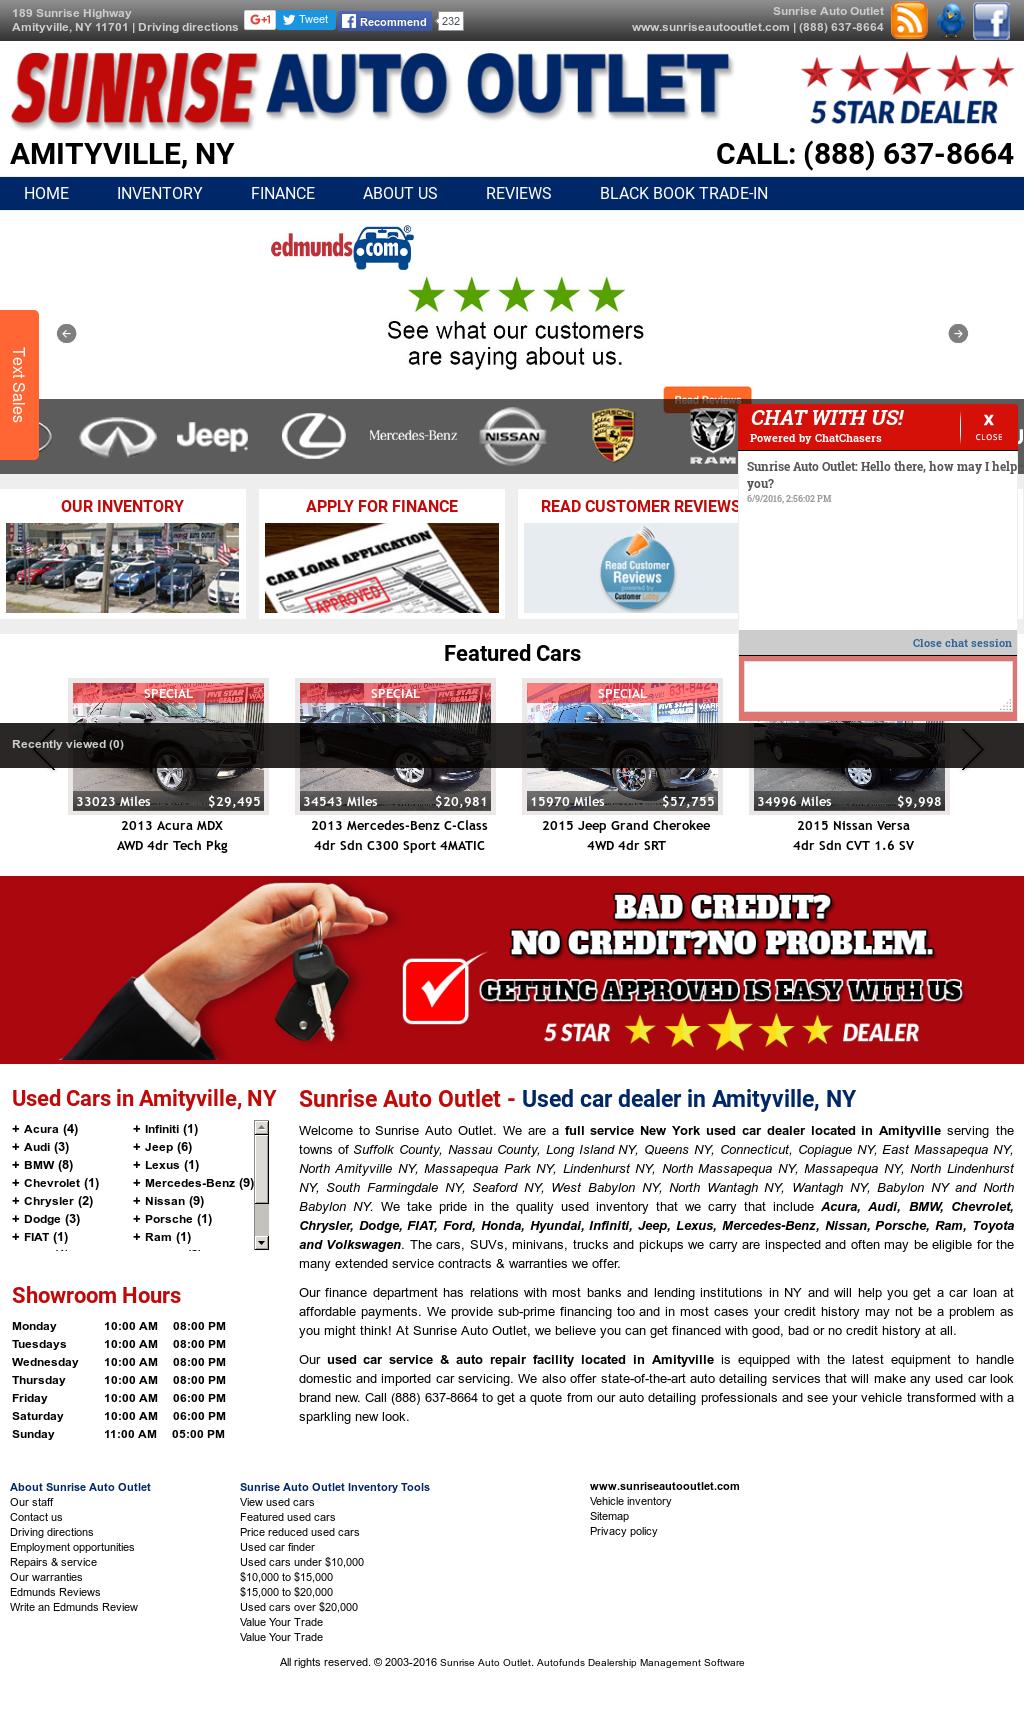 Sunrise Auto Outlet >> Sunrise Auto Outlet Competitors Revenue And Employees